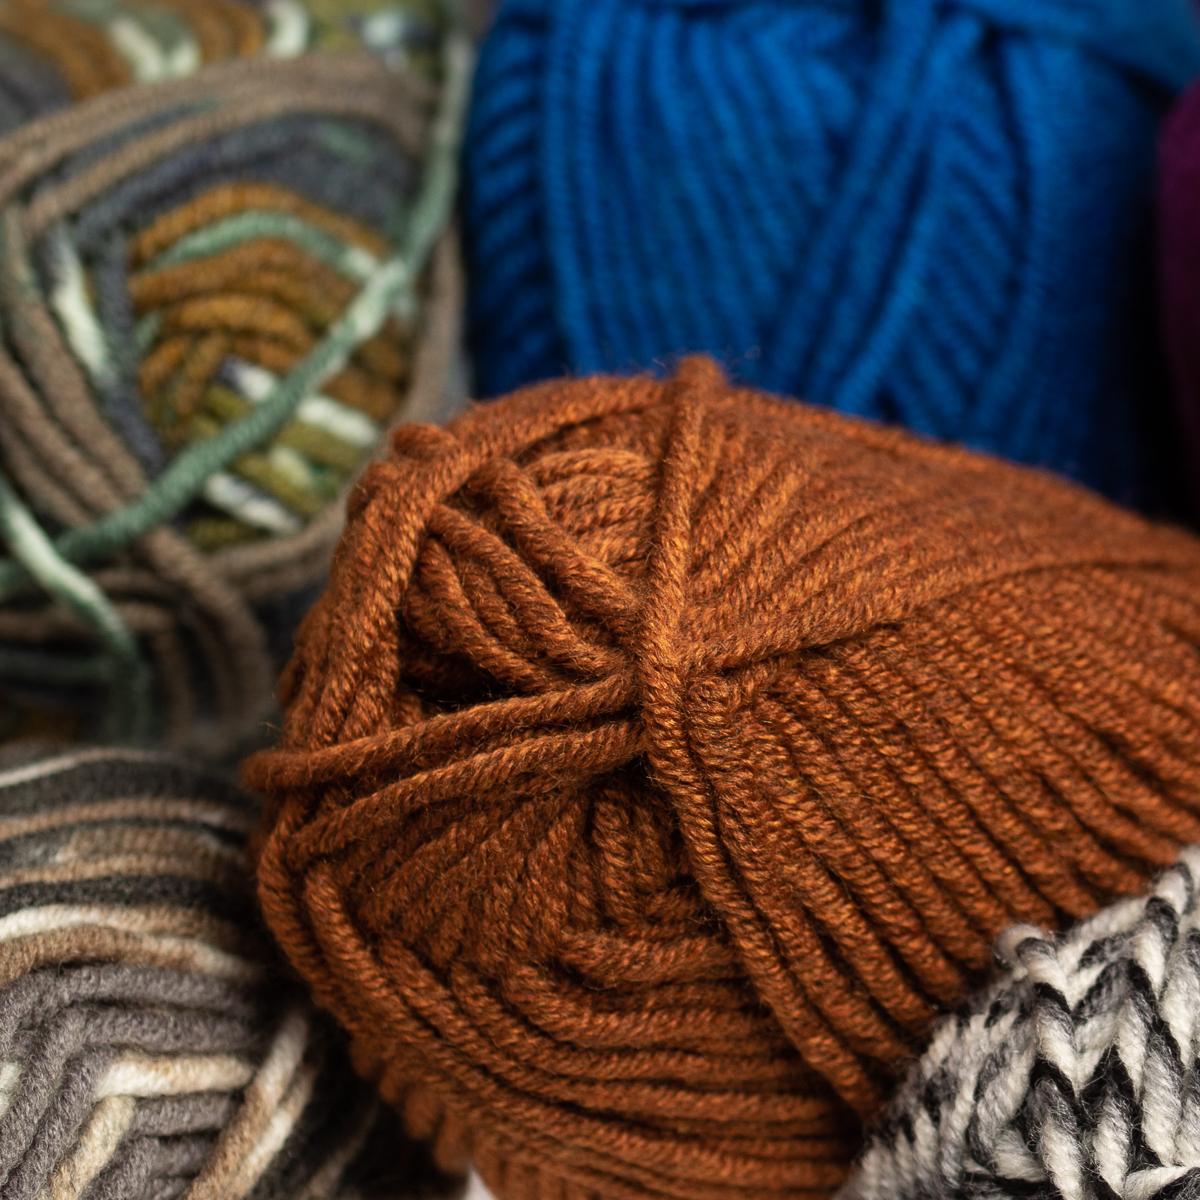 3pk-Lion-Brand-Woolspun-Acrylic-amp-Wool-Yarn-Bulky-5-Knit-Crocheting-Skeins-Soft thumbnail 34